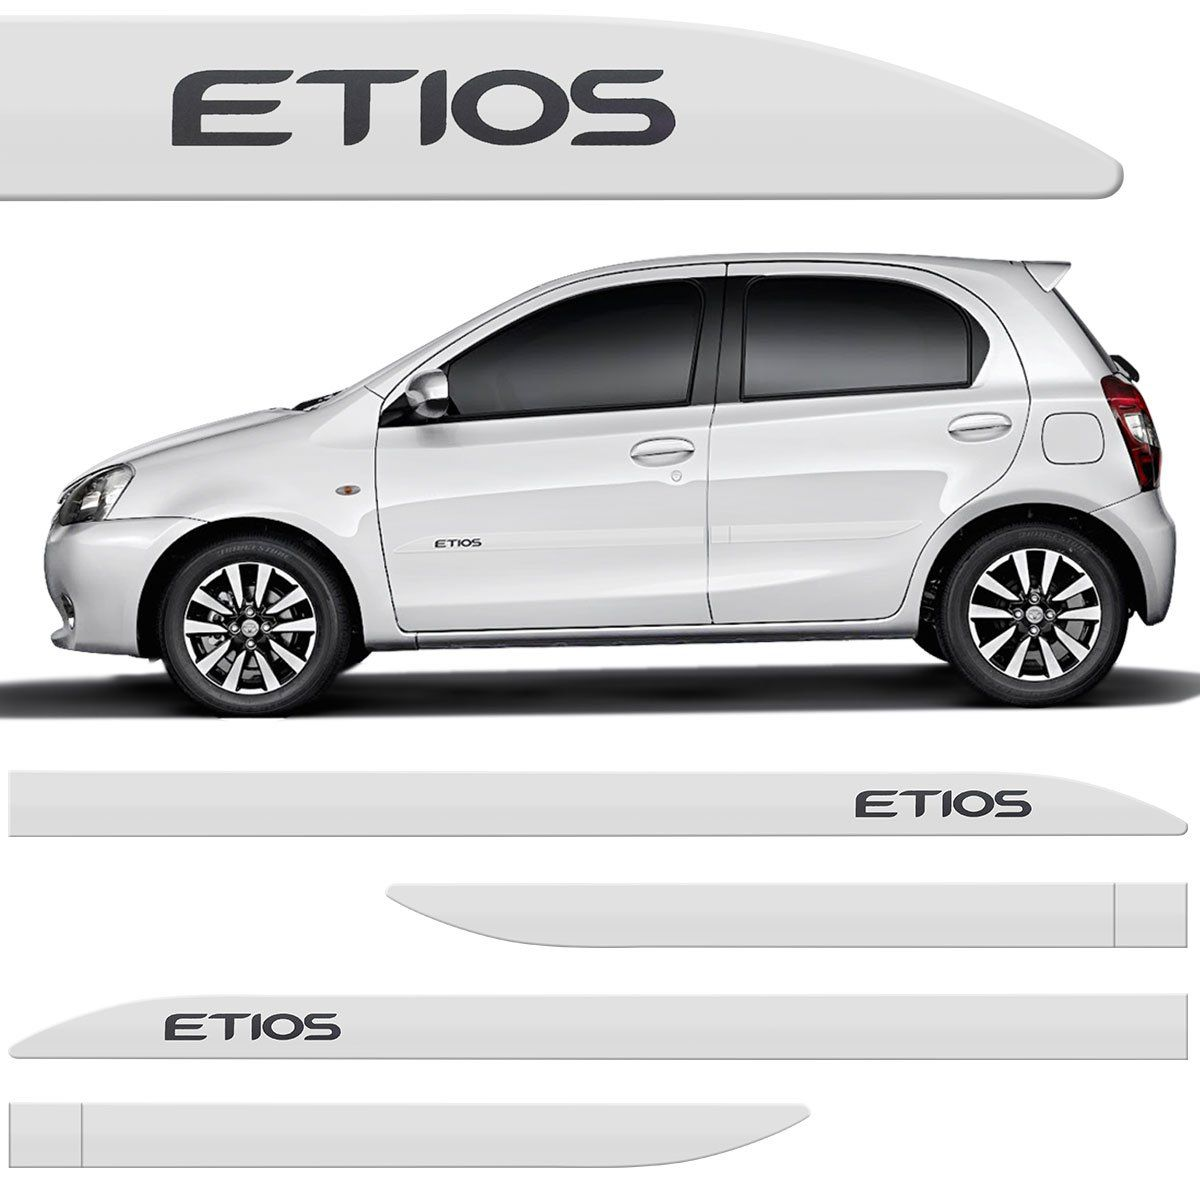 Jogo Friso Lateral Etios Hatch Sedan 2013 2014 2015 4 Peça Branco Perola